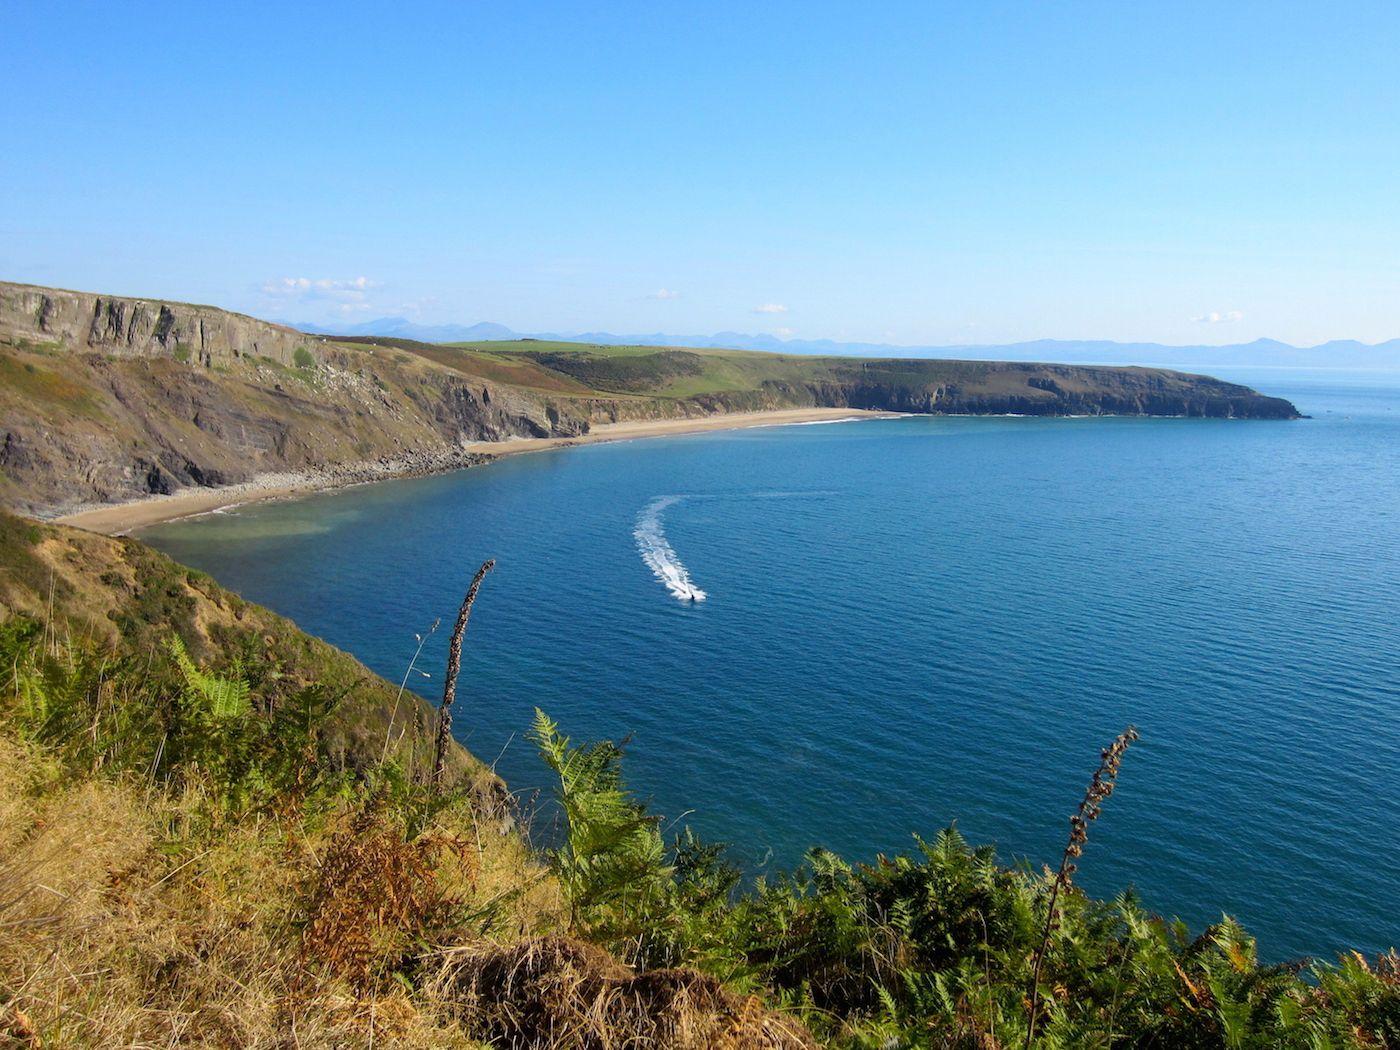 Seaside Campsites in Wales